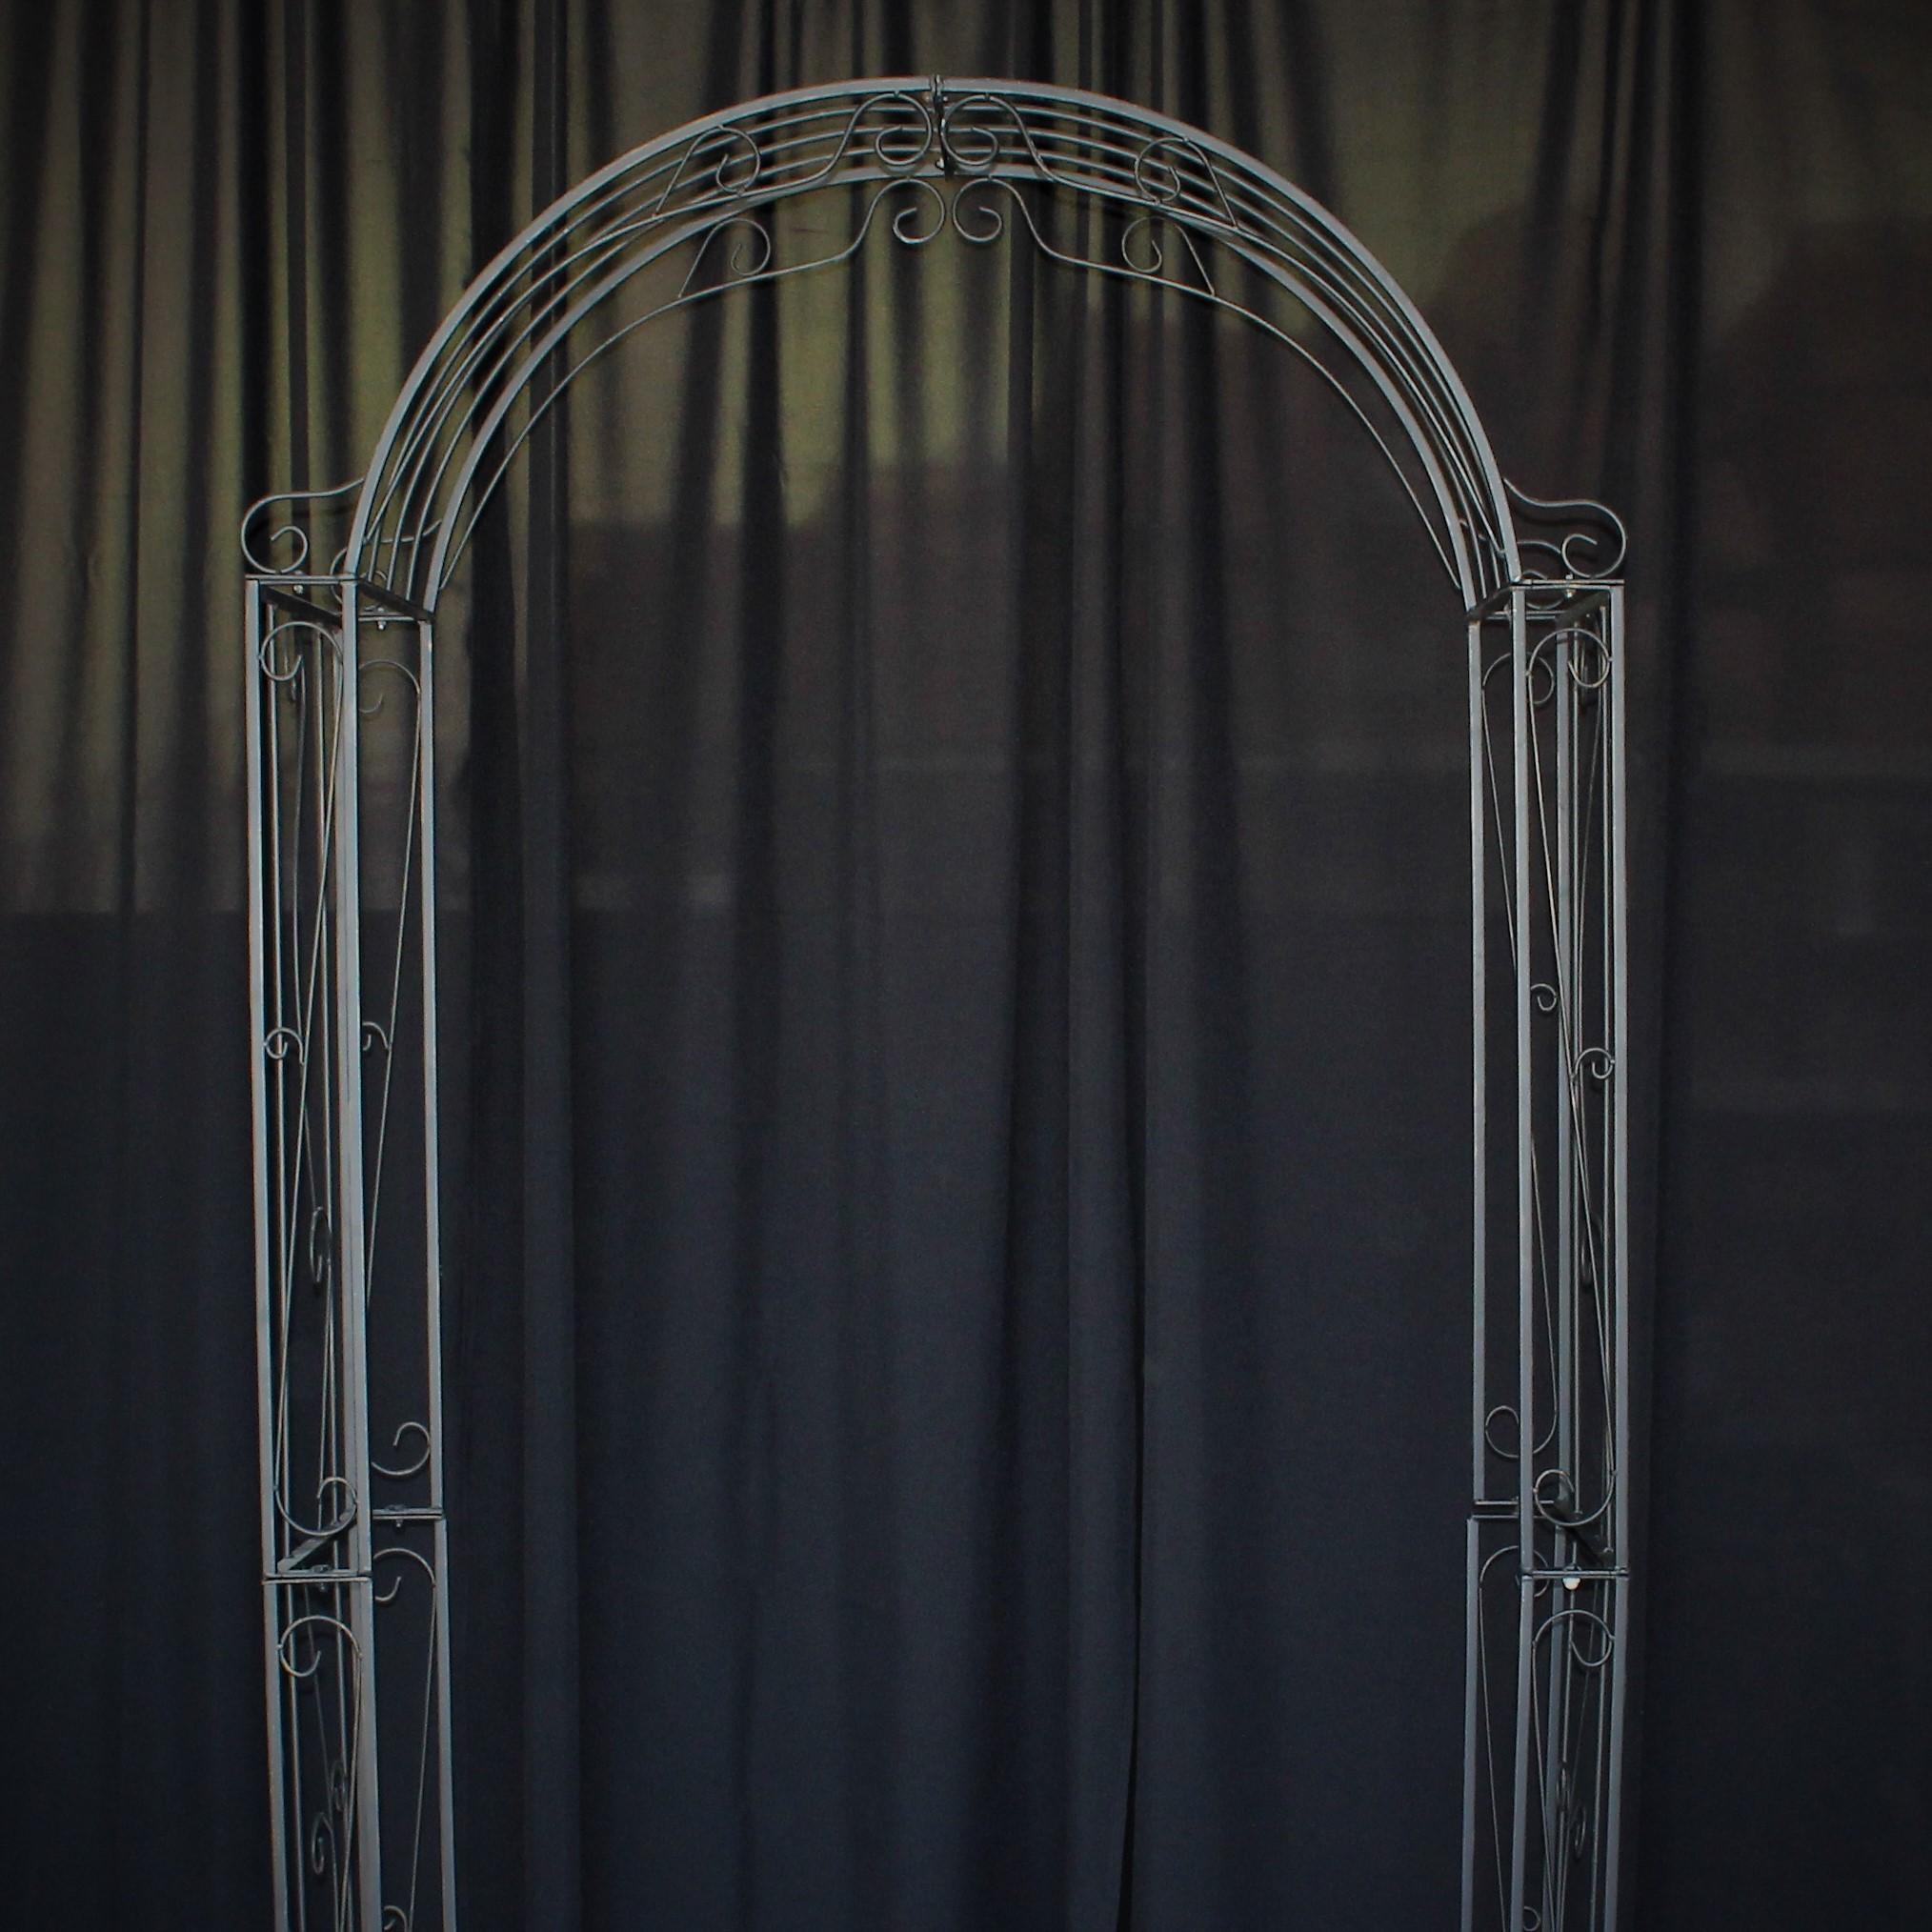 Romantic Decorative Iron Wedding Arch Indoor And Outdoor